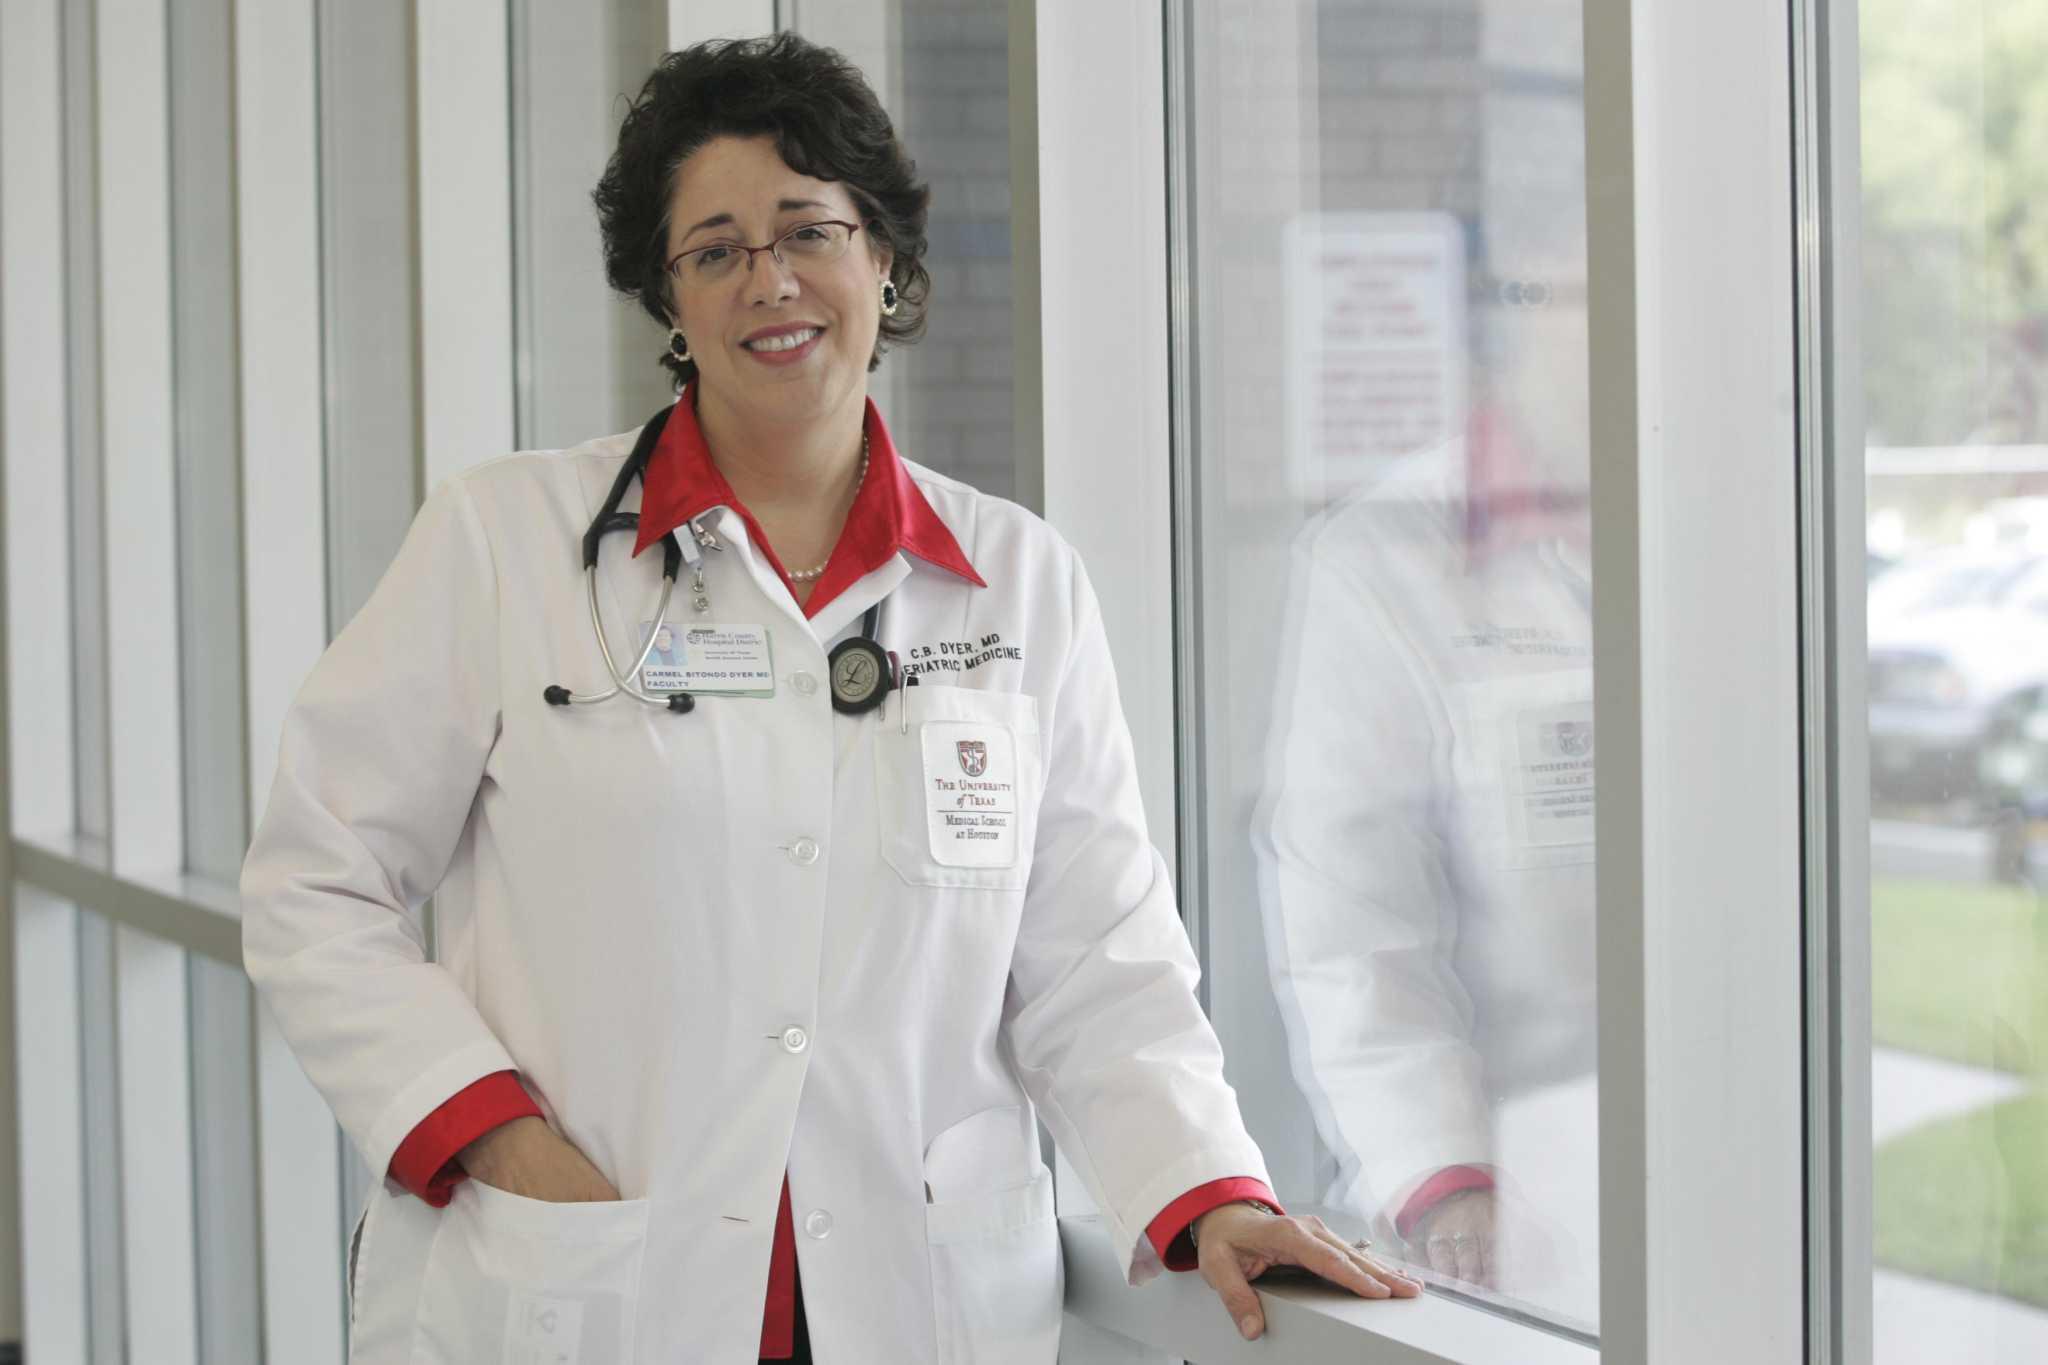 Houston geriatrician Dr. Carmel Dyer, of UTHealth, dies at age 62